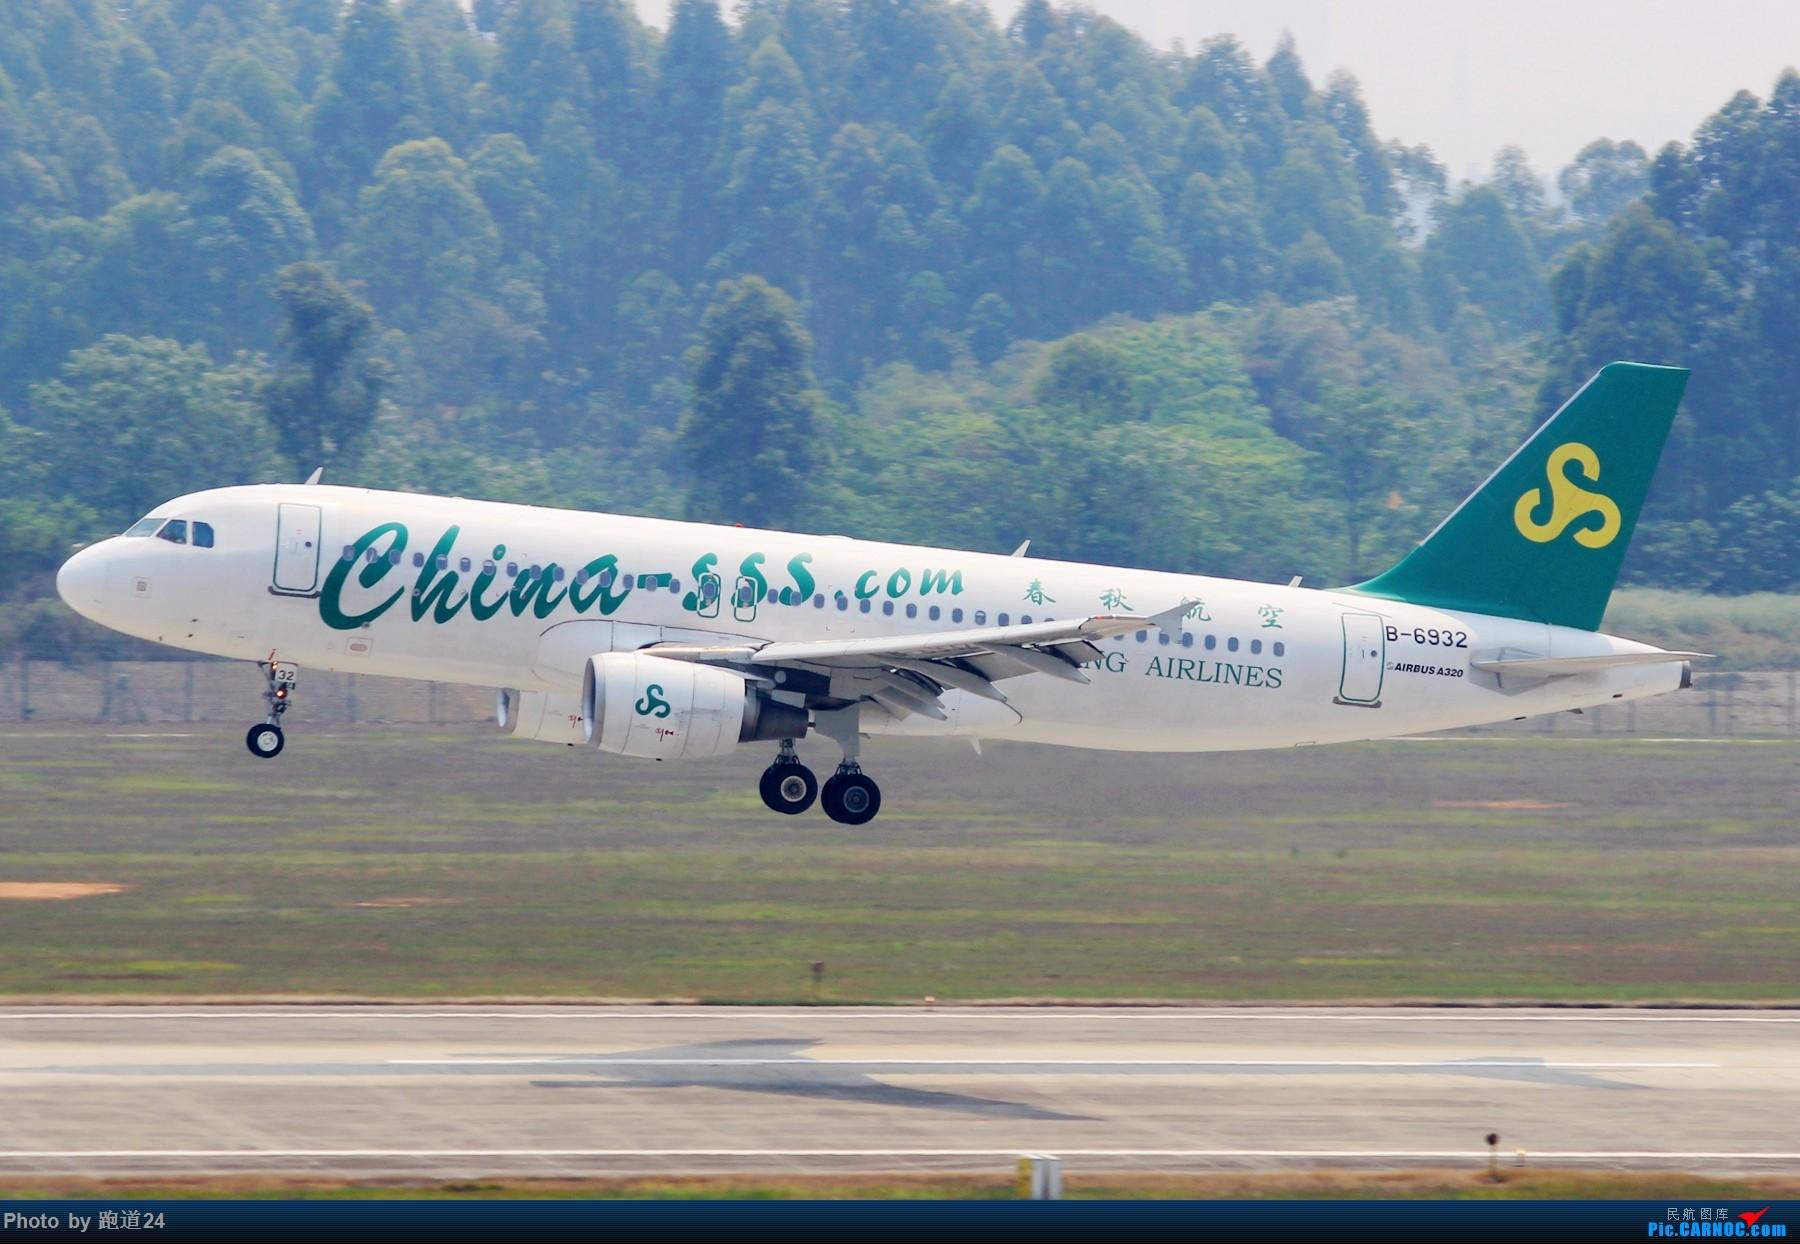 Re:[原创]【多图党】春秋航空 A320 B-6932 1800*1200 AIRBUS A320-200 B-6932 中国成都双流国际机场